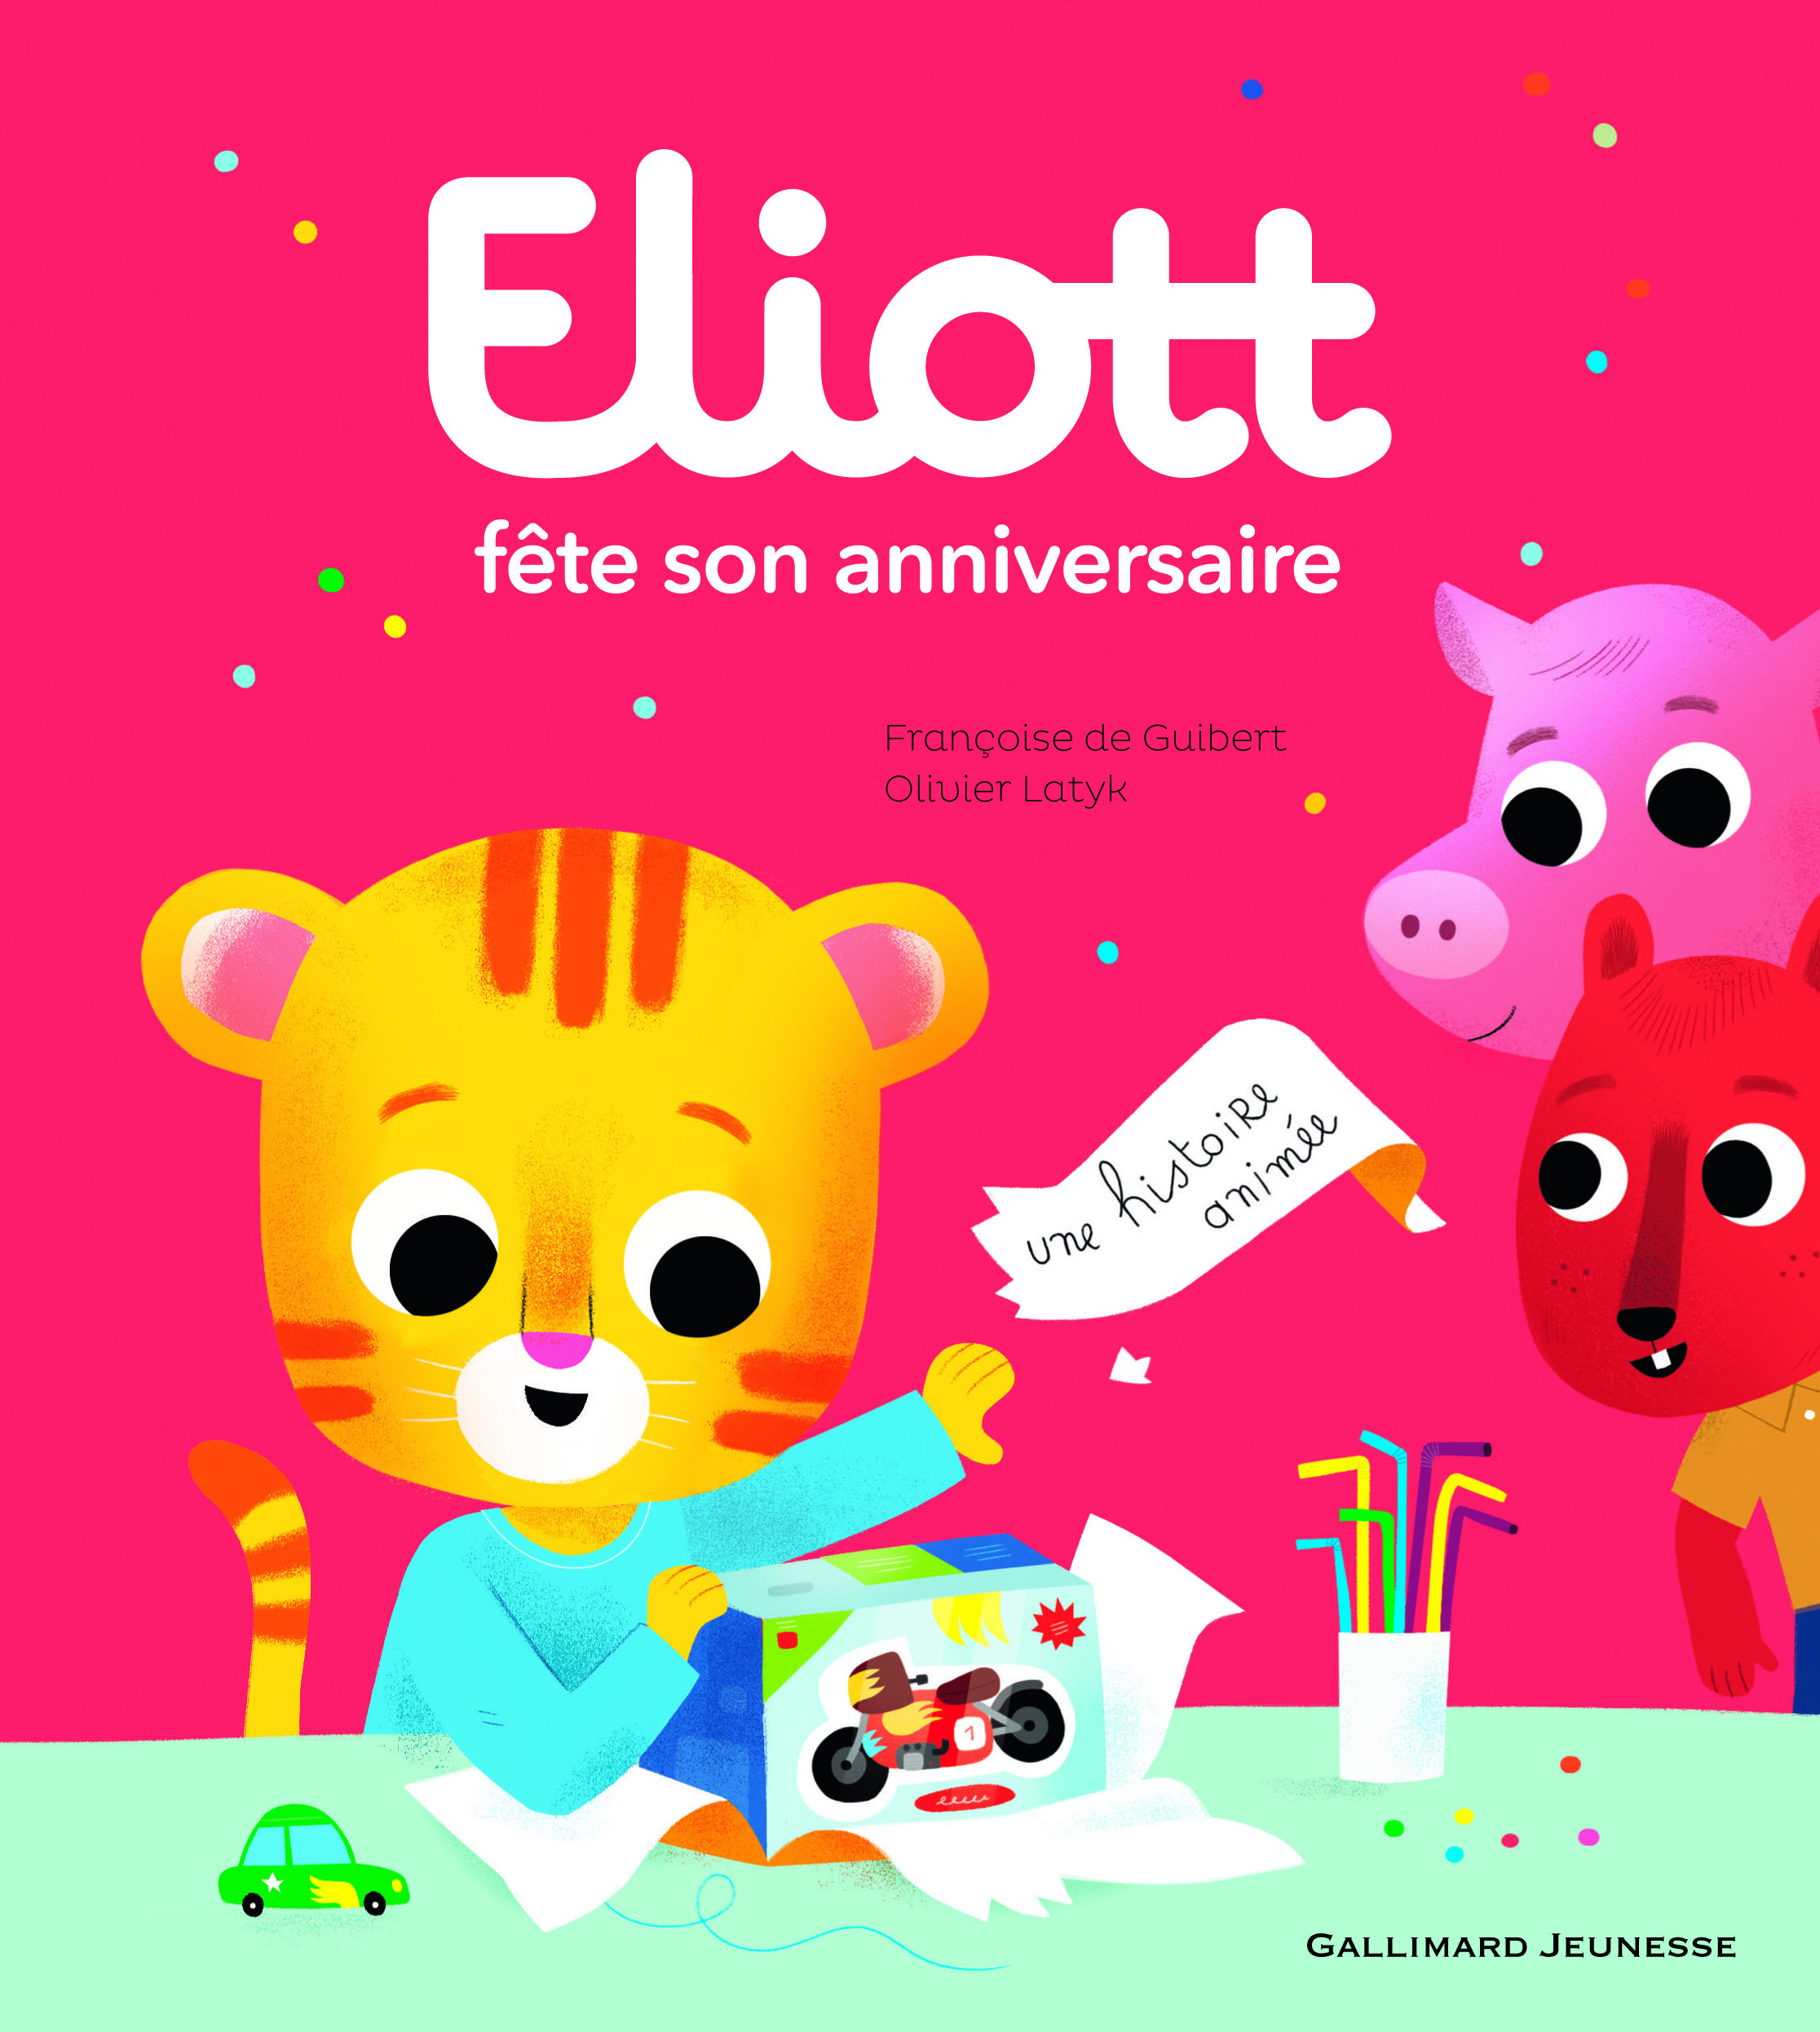 ELIOTT FETE SON ANNIVERSAIRE - ELIOTT 4